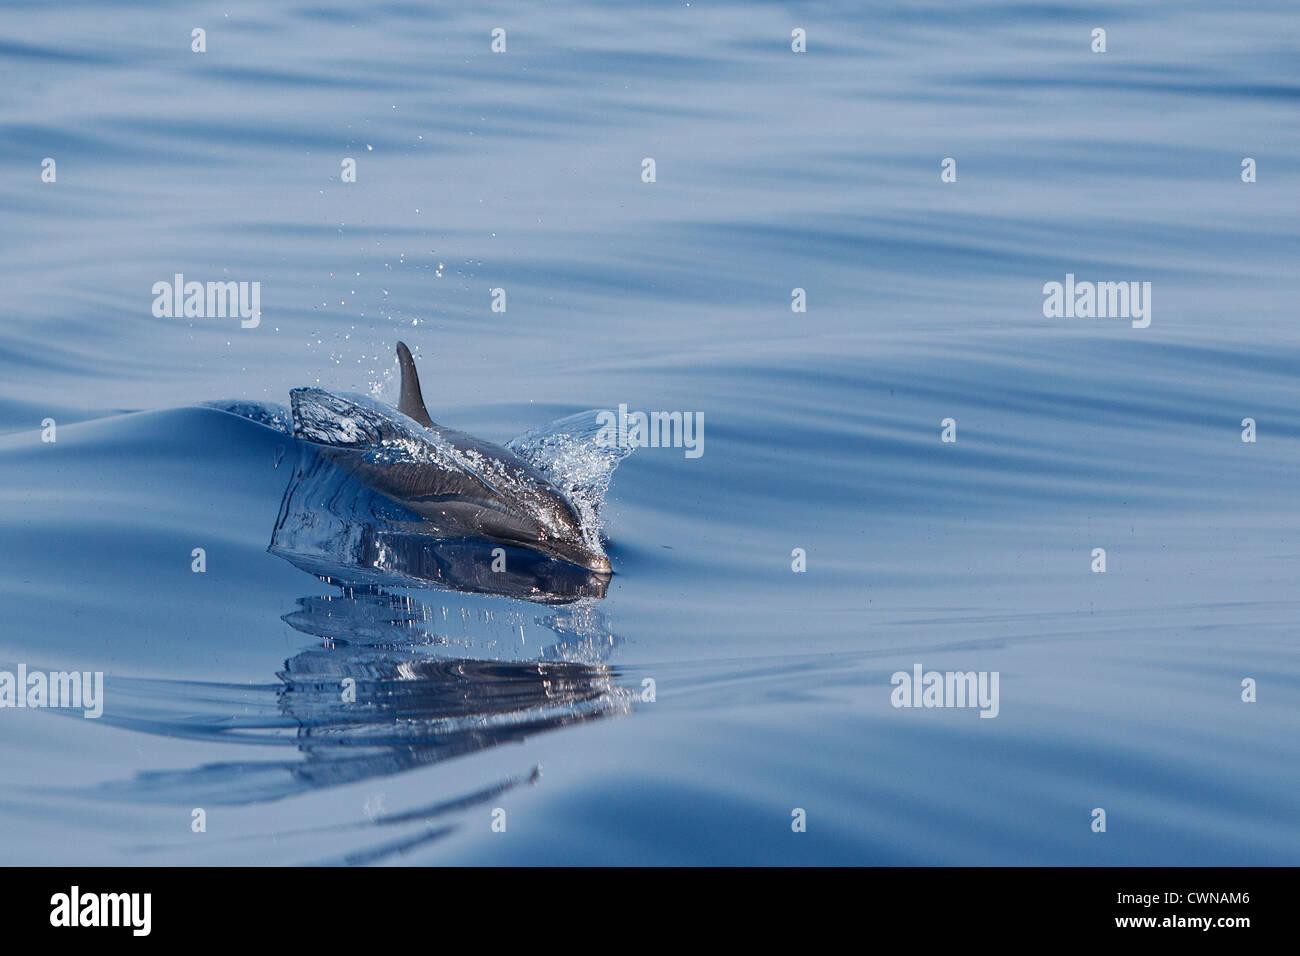 Pantropical Spotted Dolphin, Stenella attenuata, Schlankdelfin, surfacing, Maldives - Stock Image